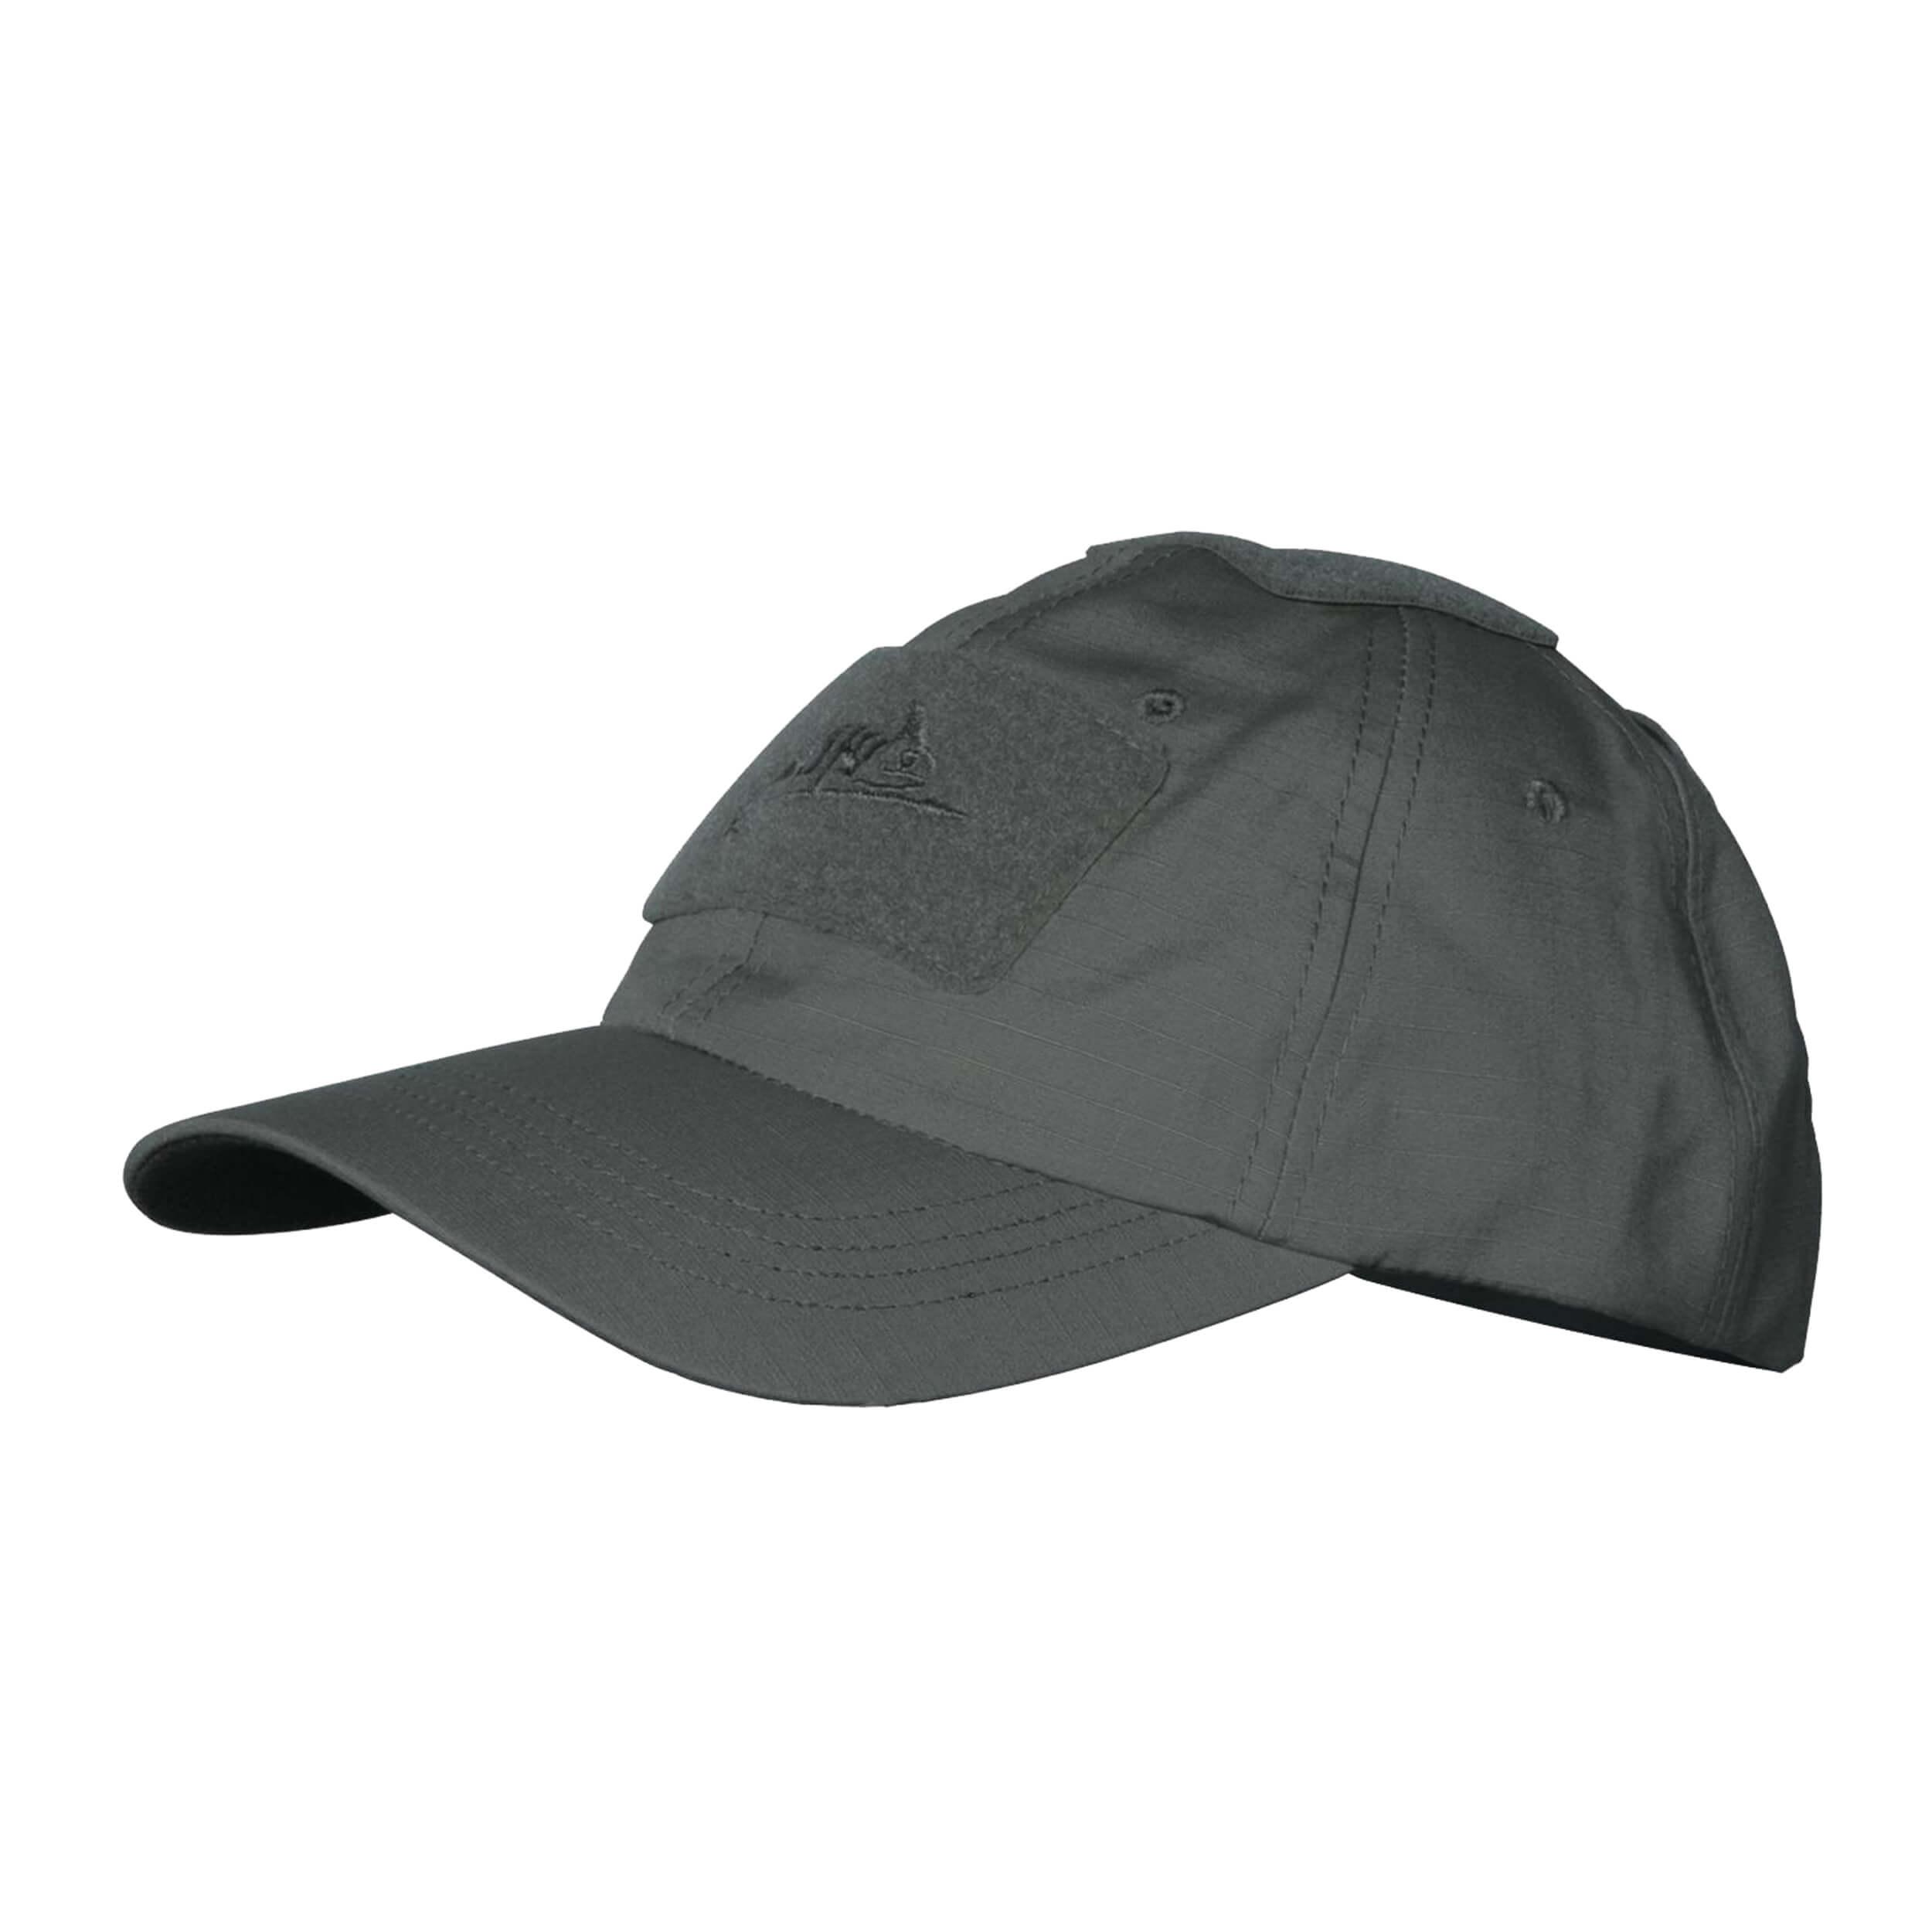 Helikon-Tex Tactical BBC Cap - PolyCotton Ripstop - Shadow Grey